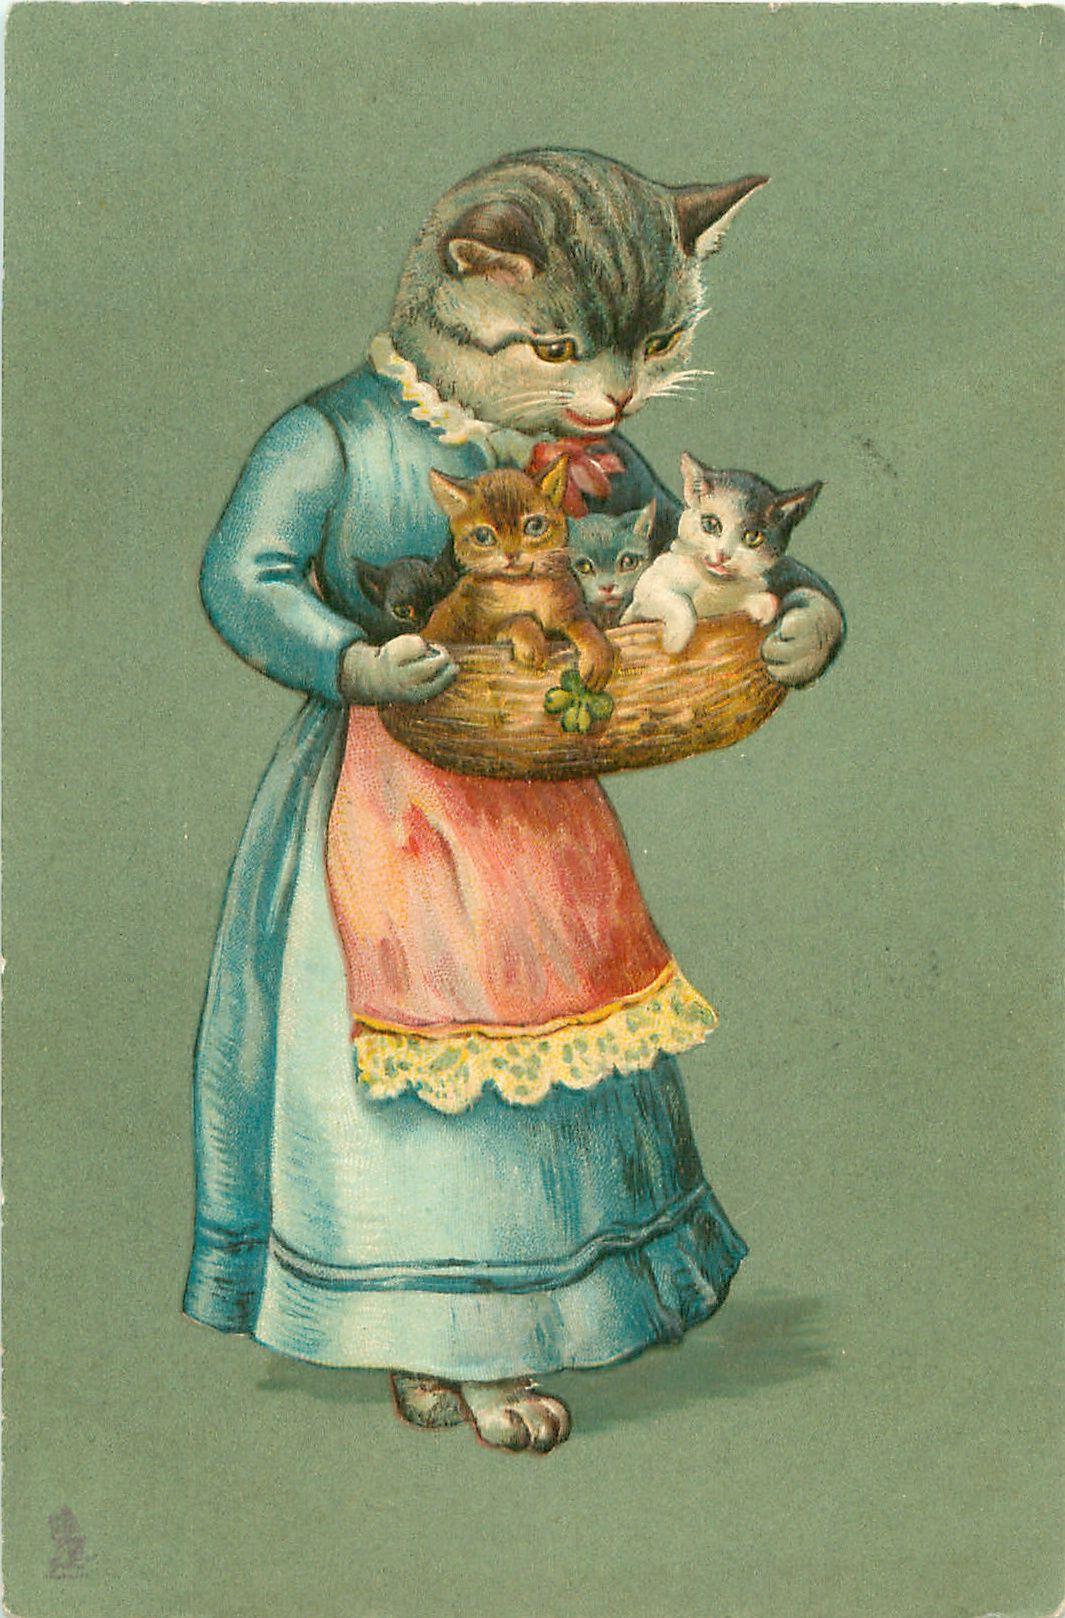 Злости прикол, ретро открытка кот